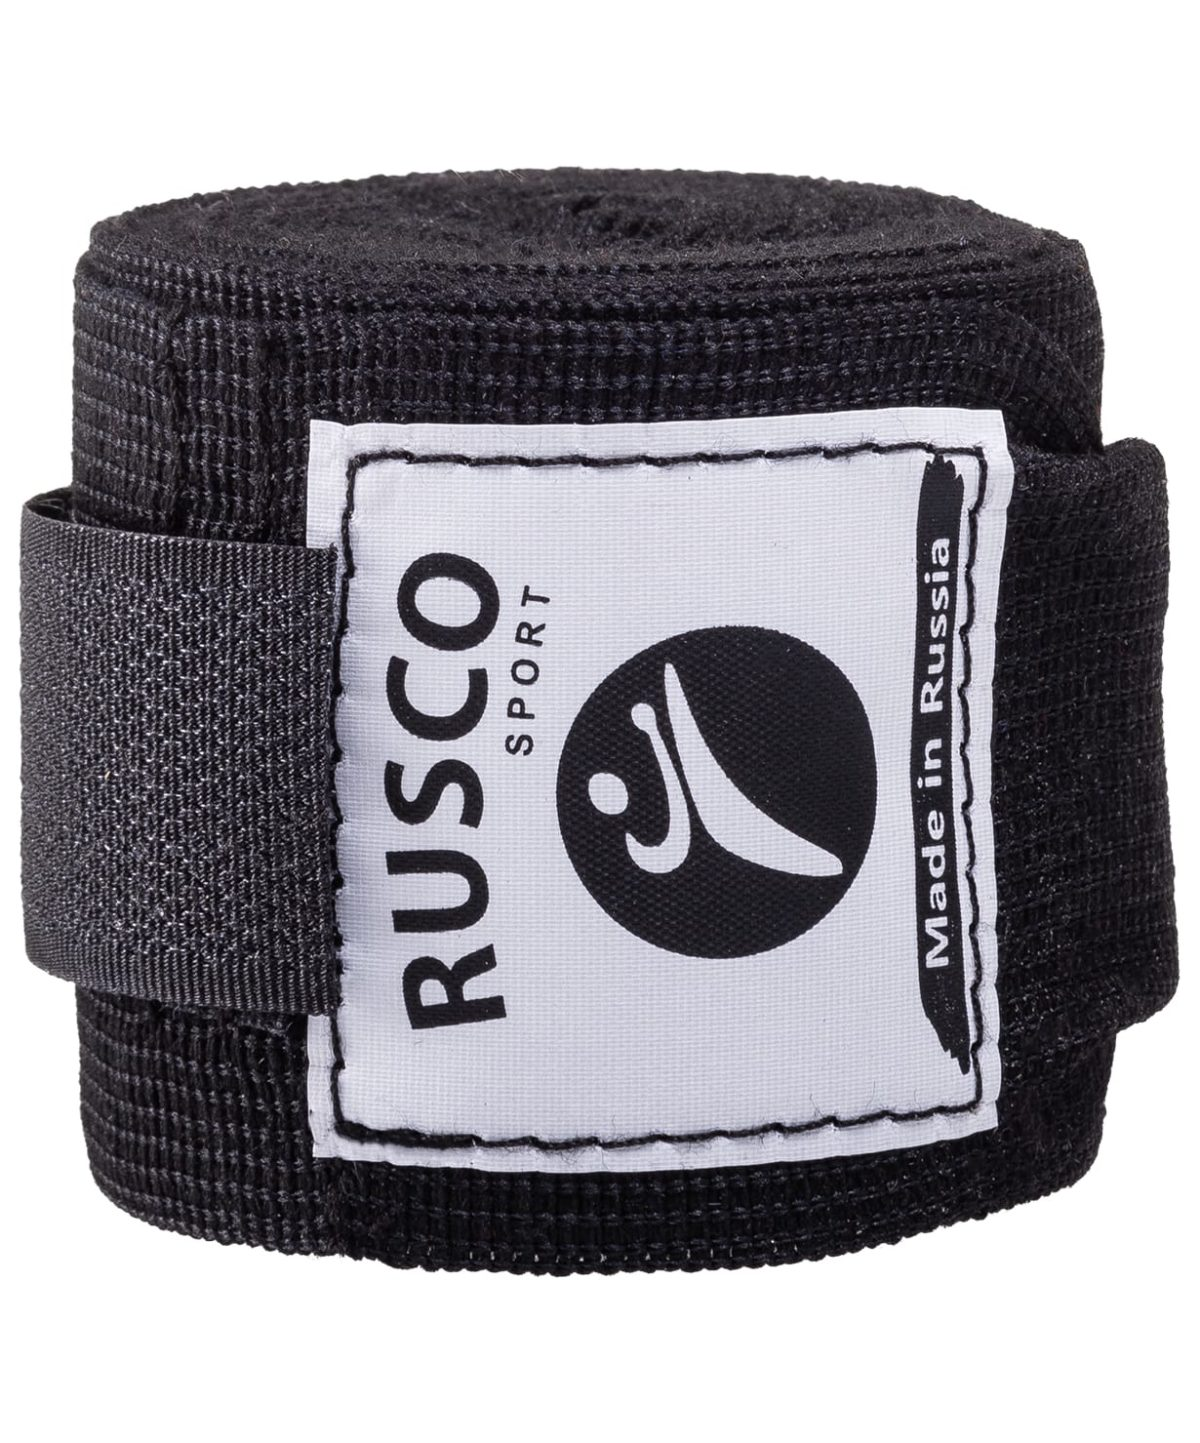 RUSCO Бинт боксерский, 2,5м, хлопок  126: чёрный - 2